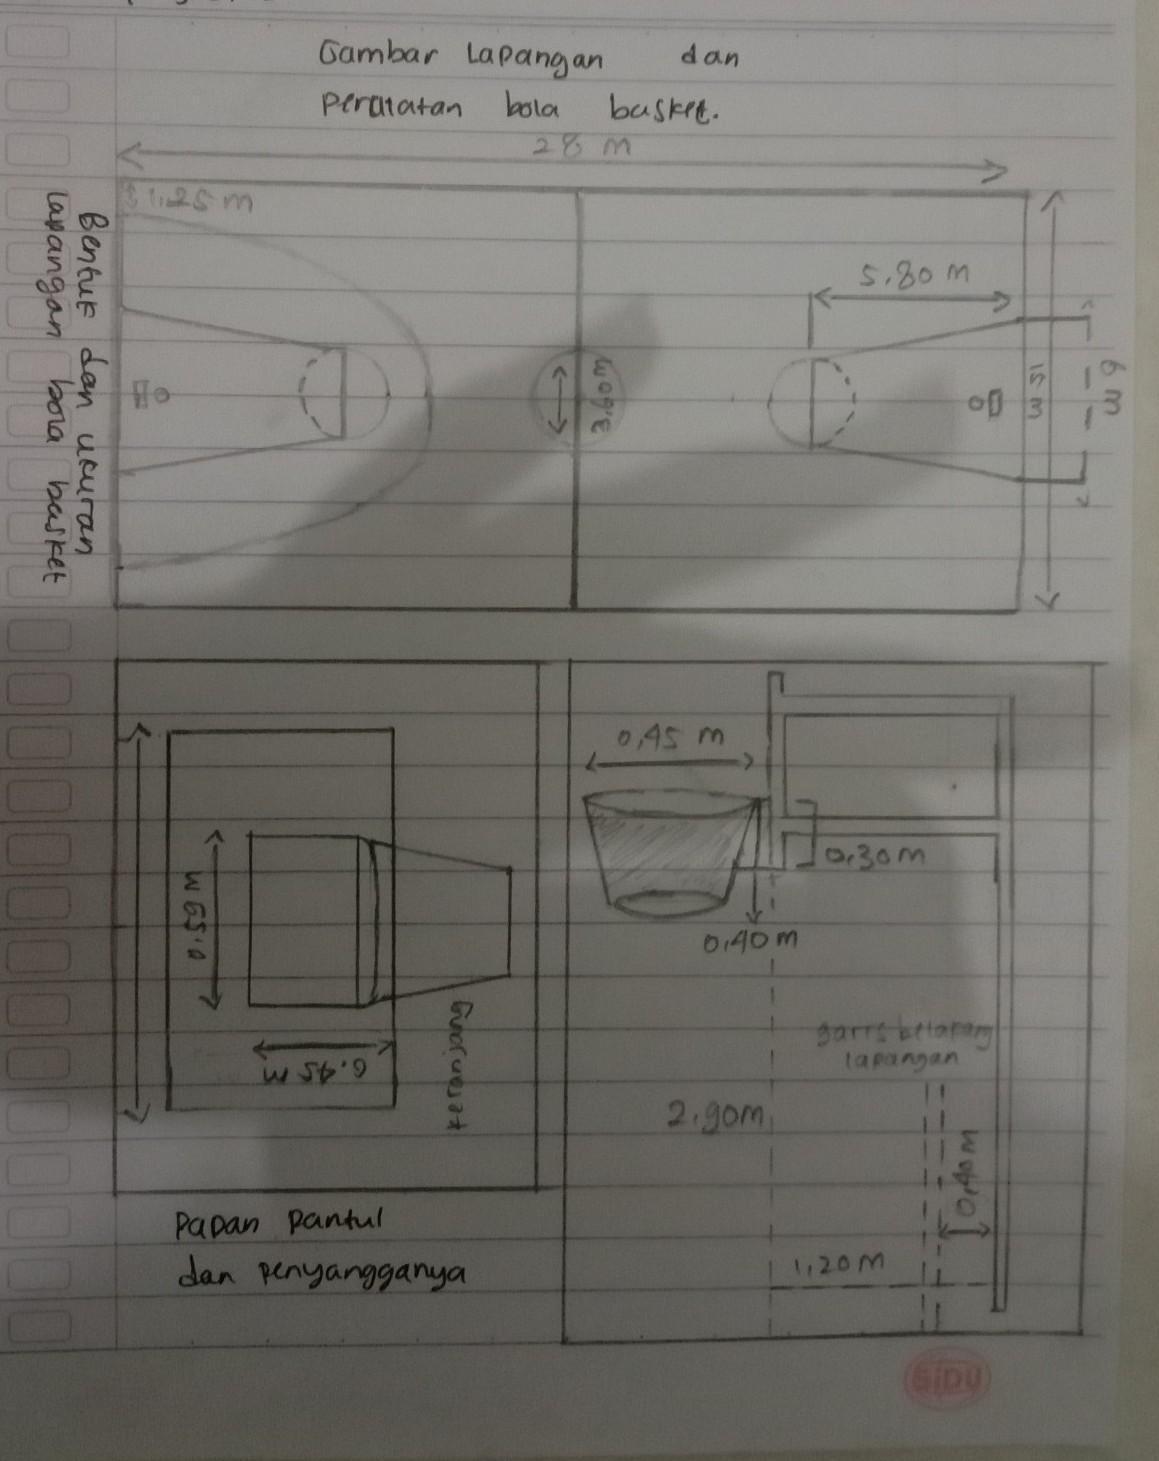 5 Buatlah Lapangan Bola Basket Beserta Ukurannya Brainly Co Id